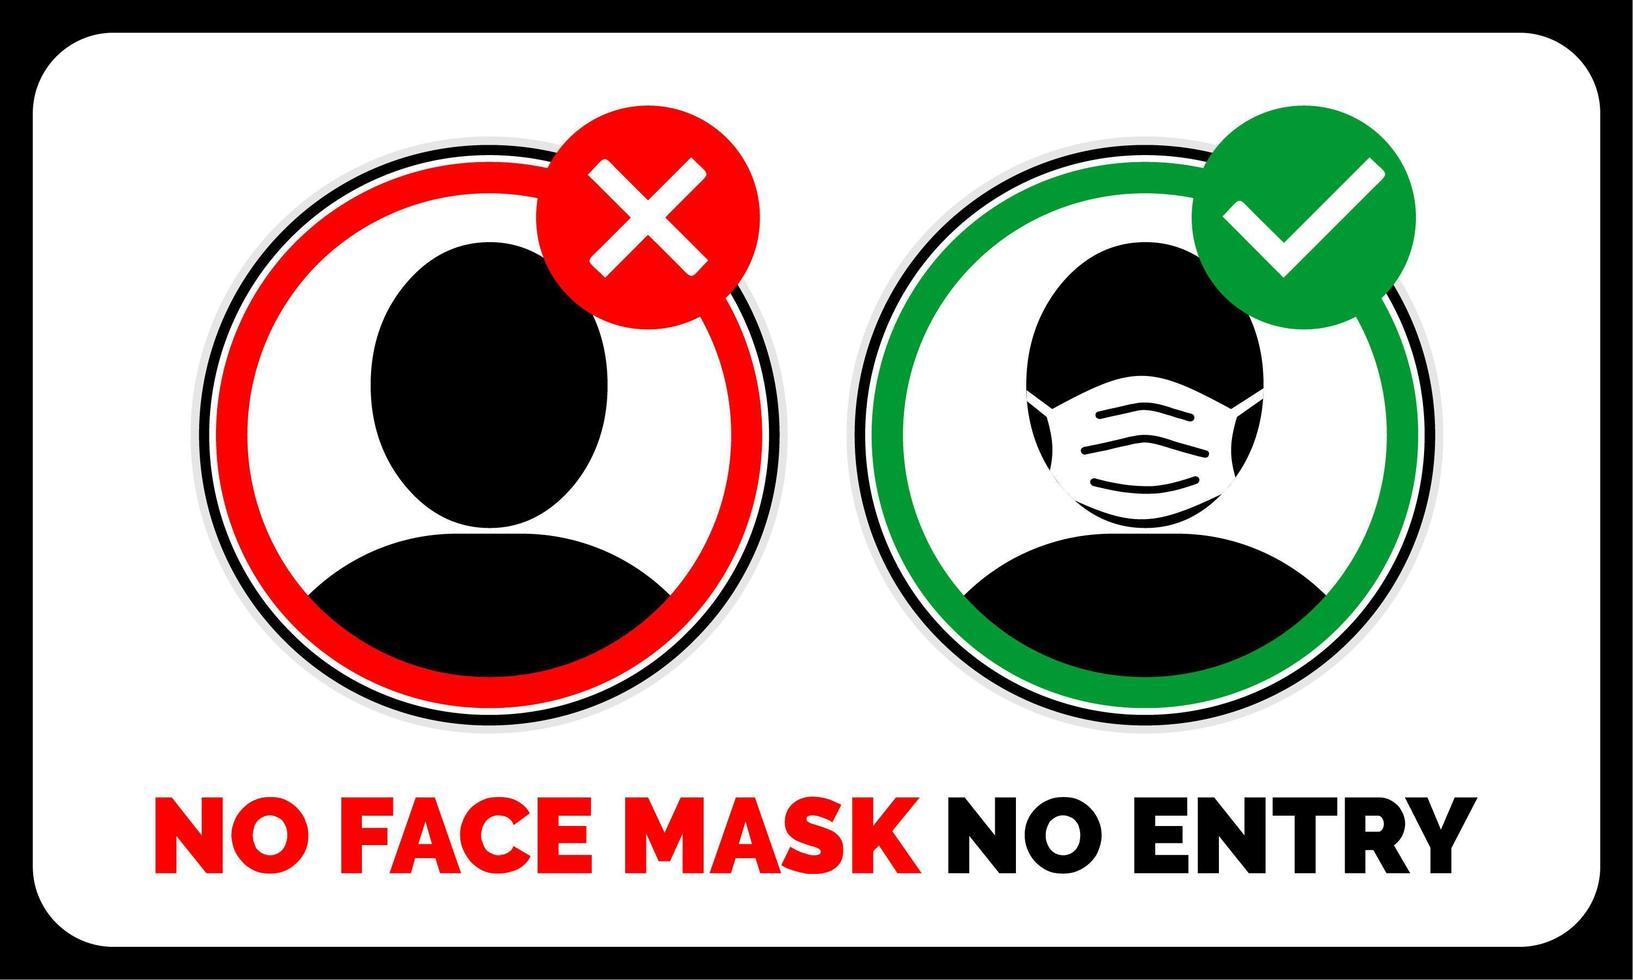 nessuna maschera facciale, nessun avviso di ingresso vettore